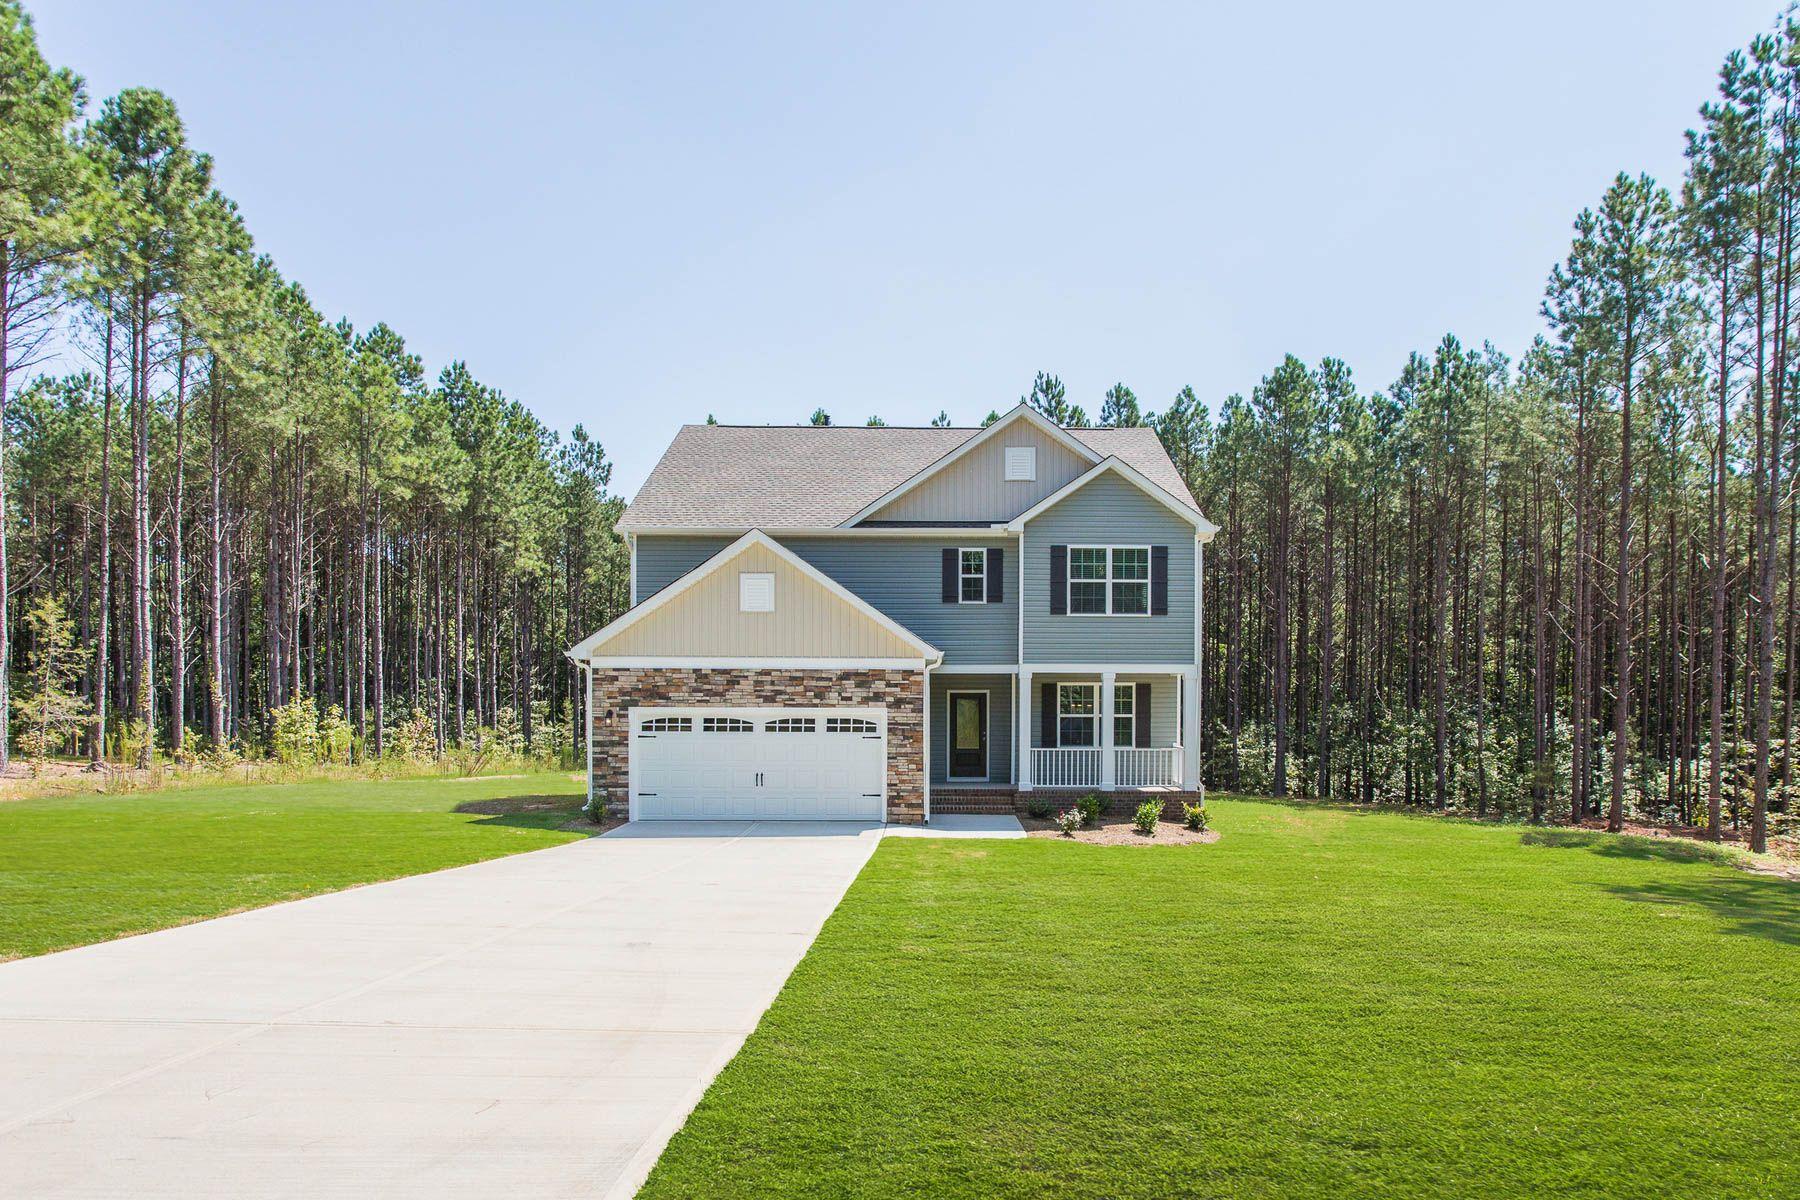 The Jackson :LGI Homes - Weatherby